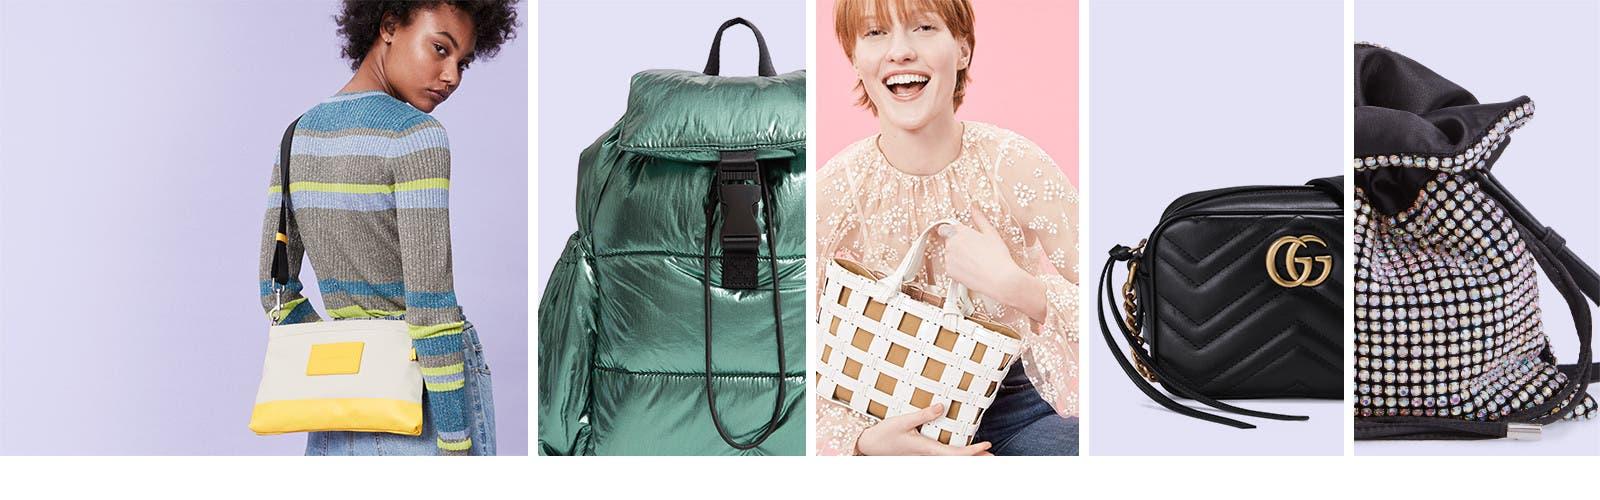 The Handbag Edit